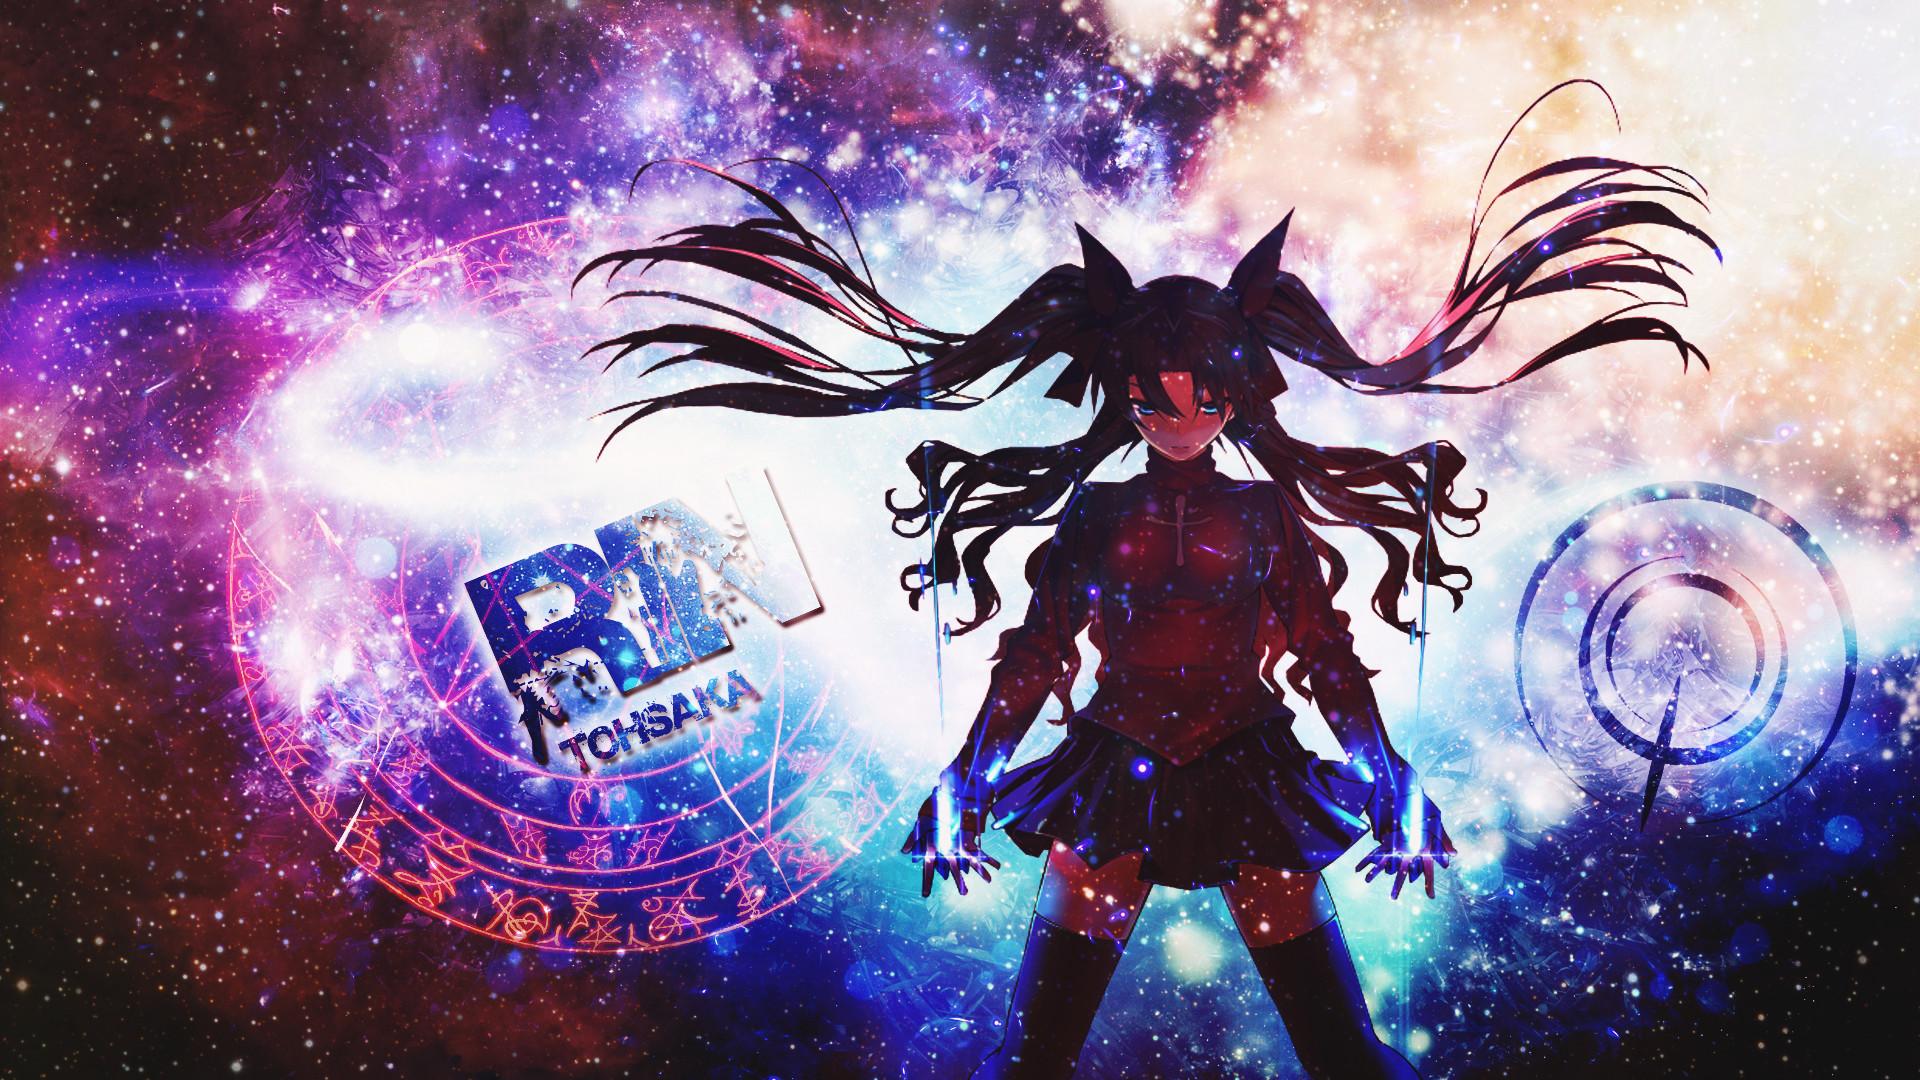 Anime – Fate/Stay Night: Unlimited Blade Works Rin Tohsaka Bakgrund